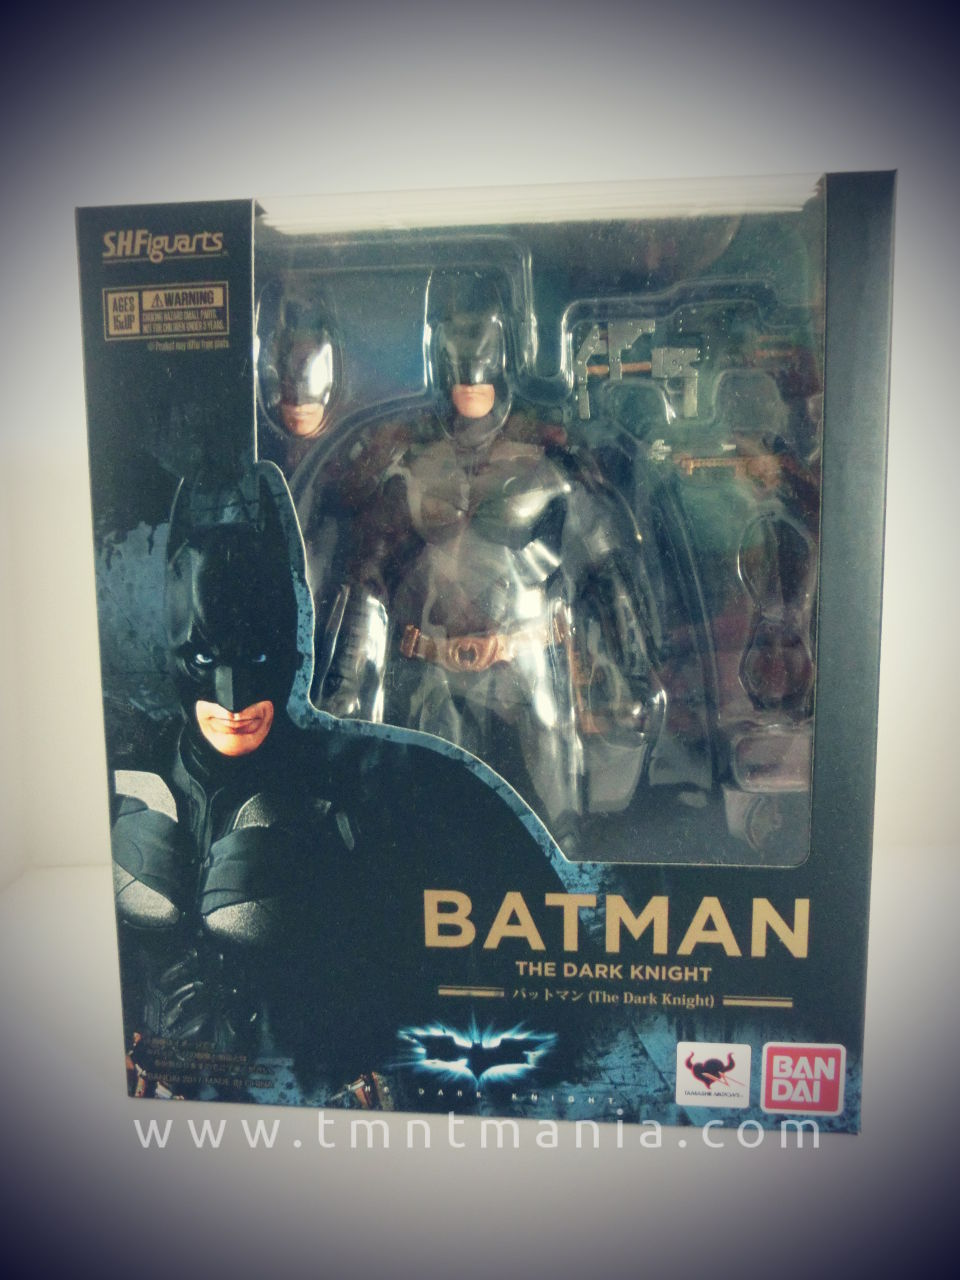 SH Figuarts Batman Packaging Front